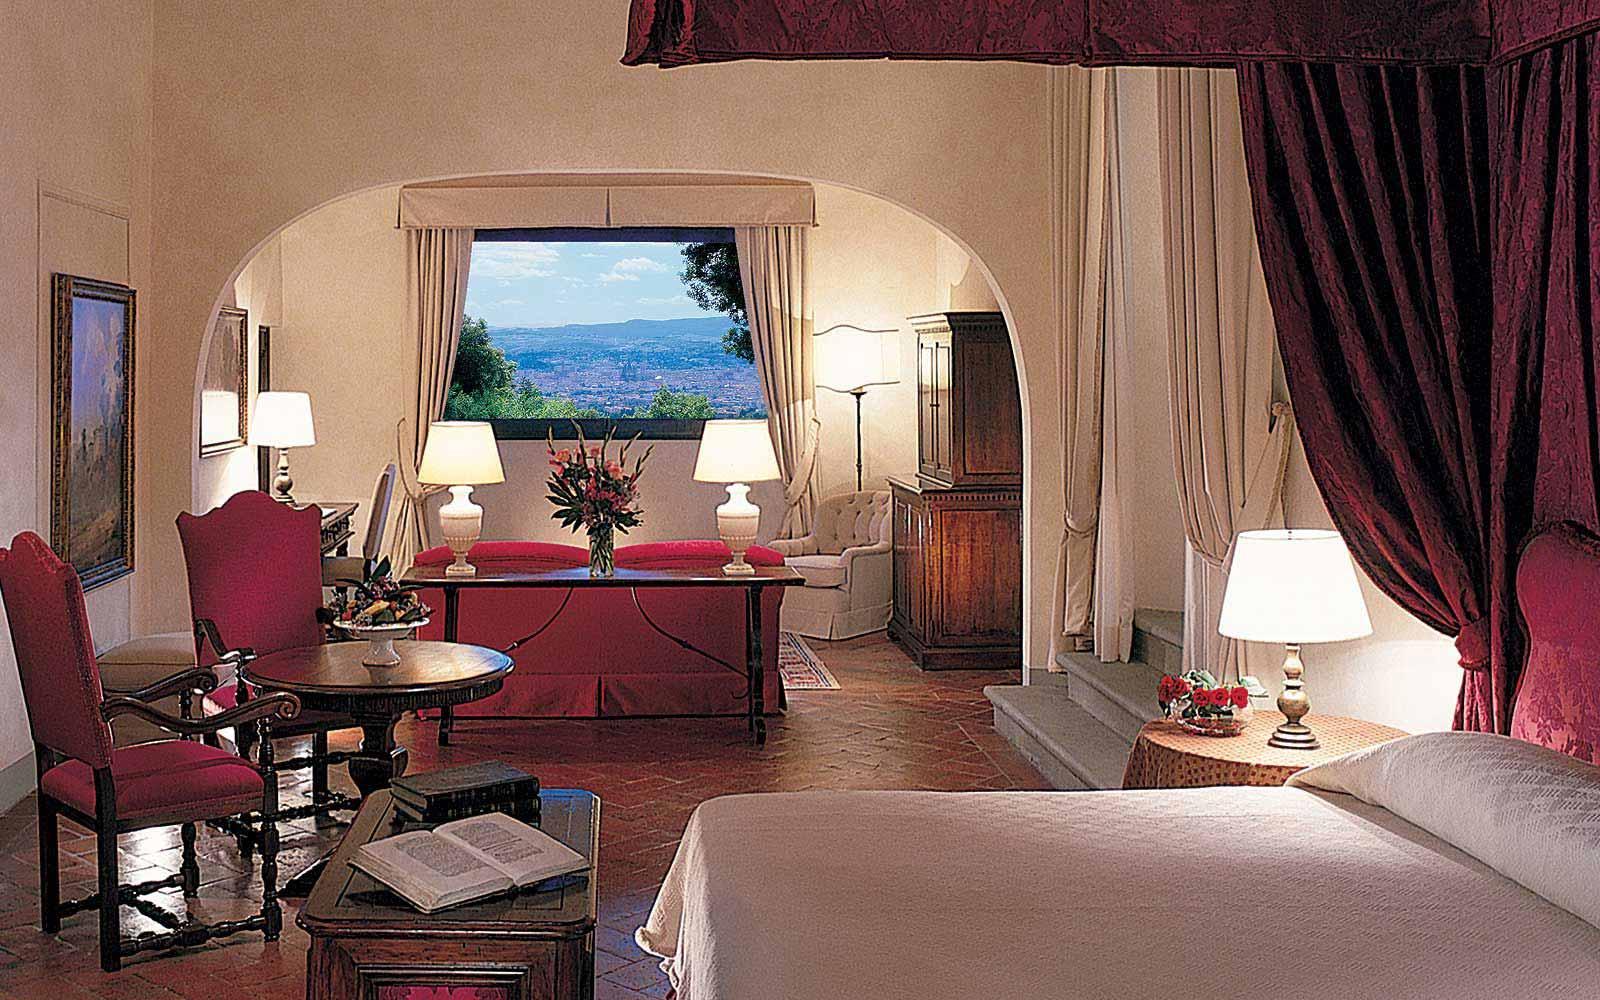 Michelangelo Suite at Belmond Villa San Michele